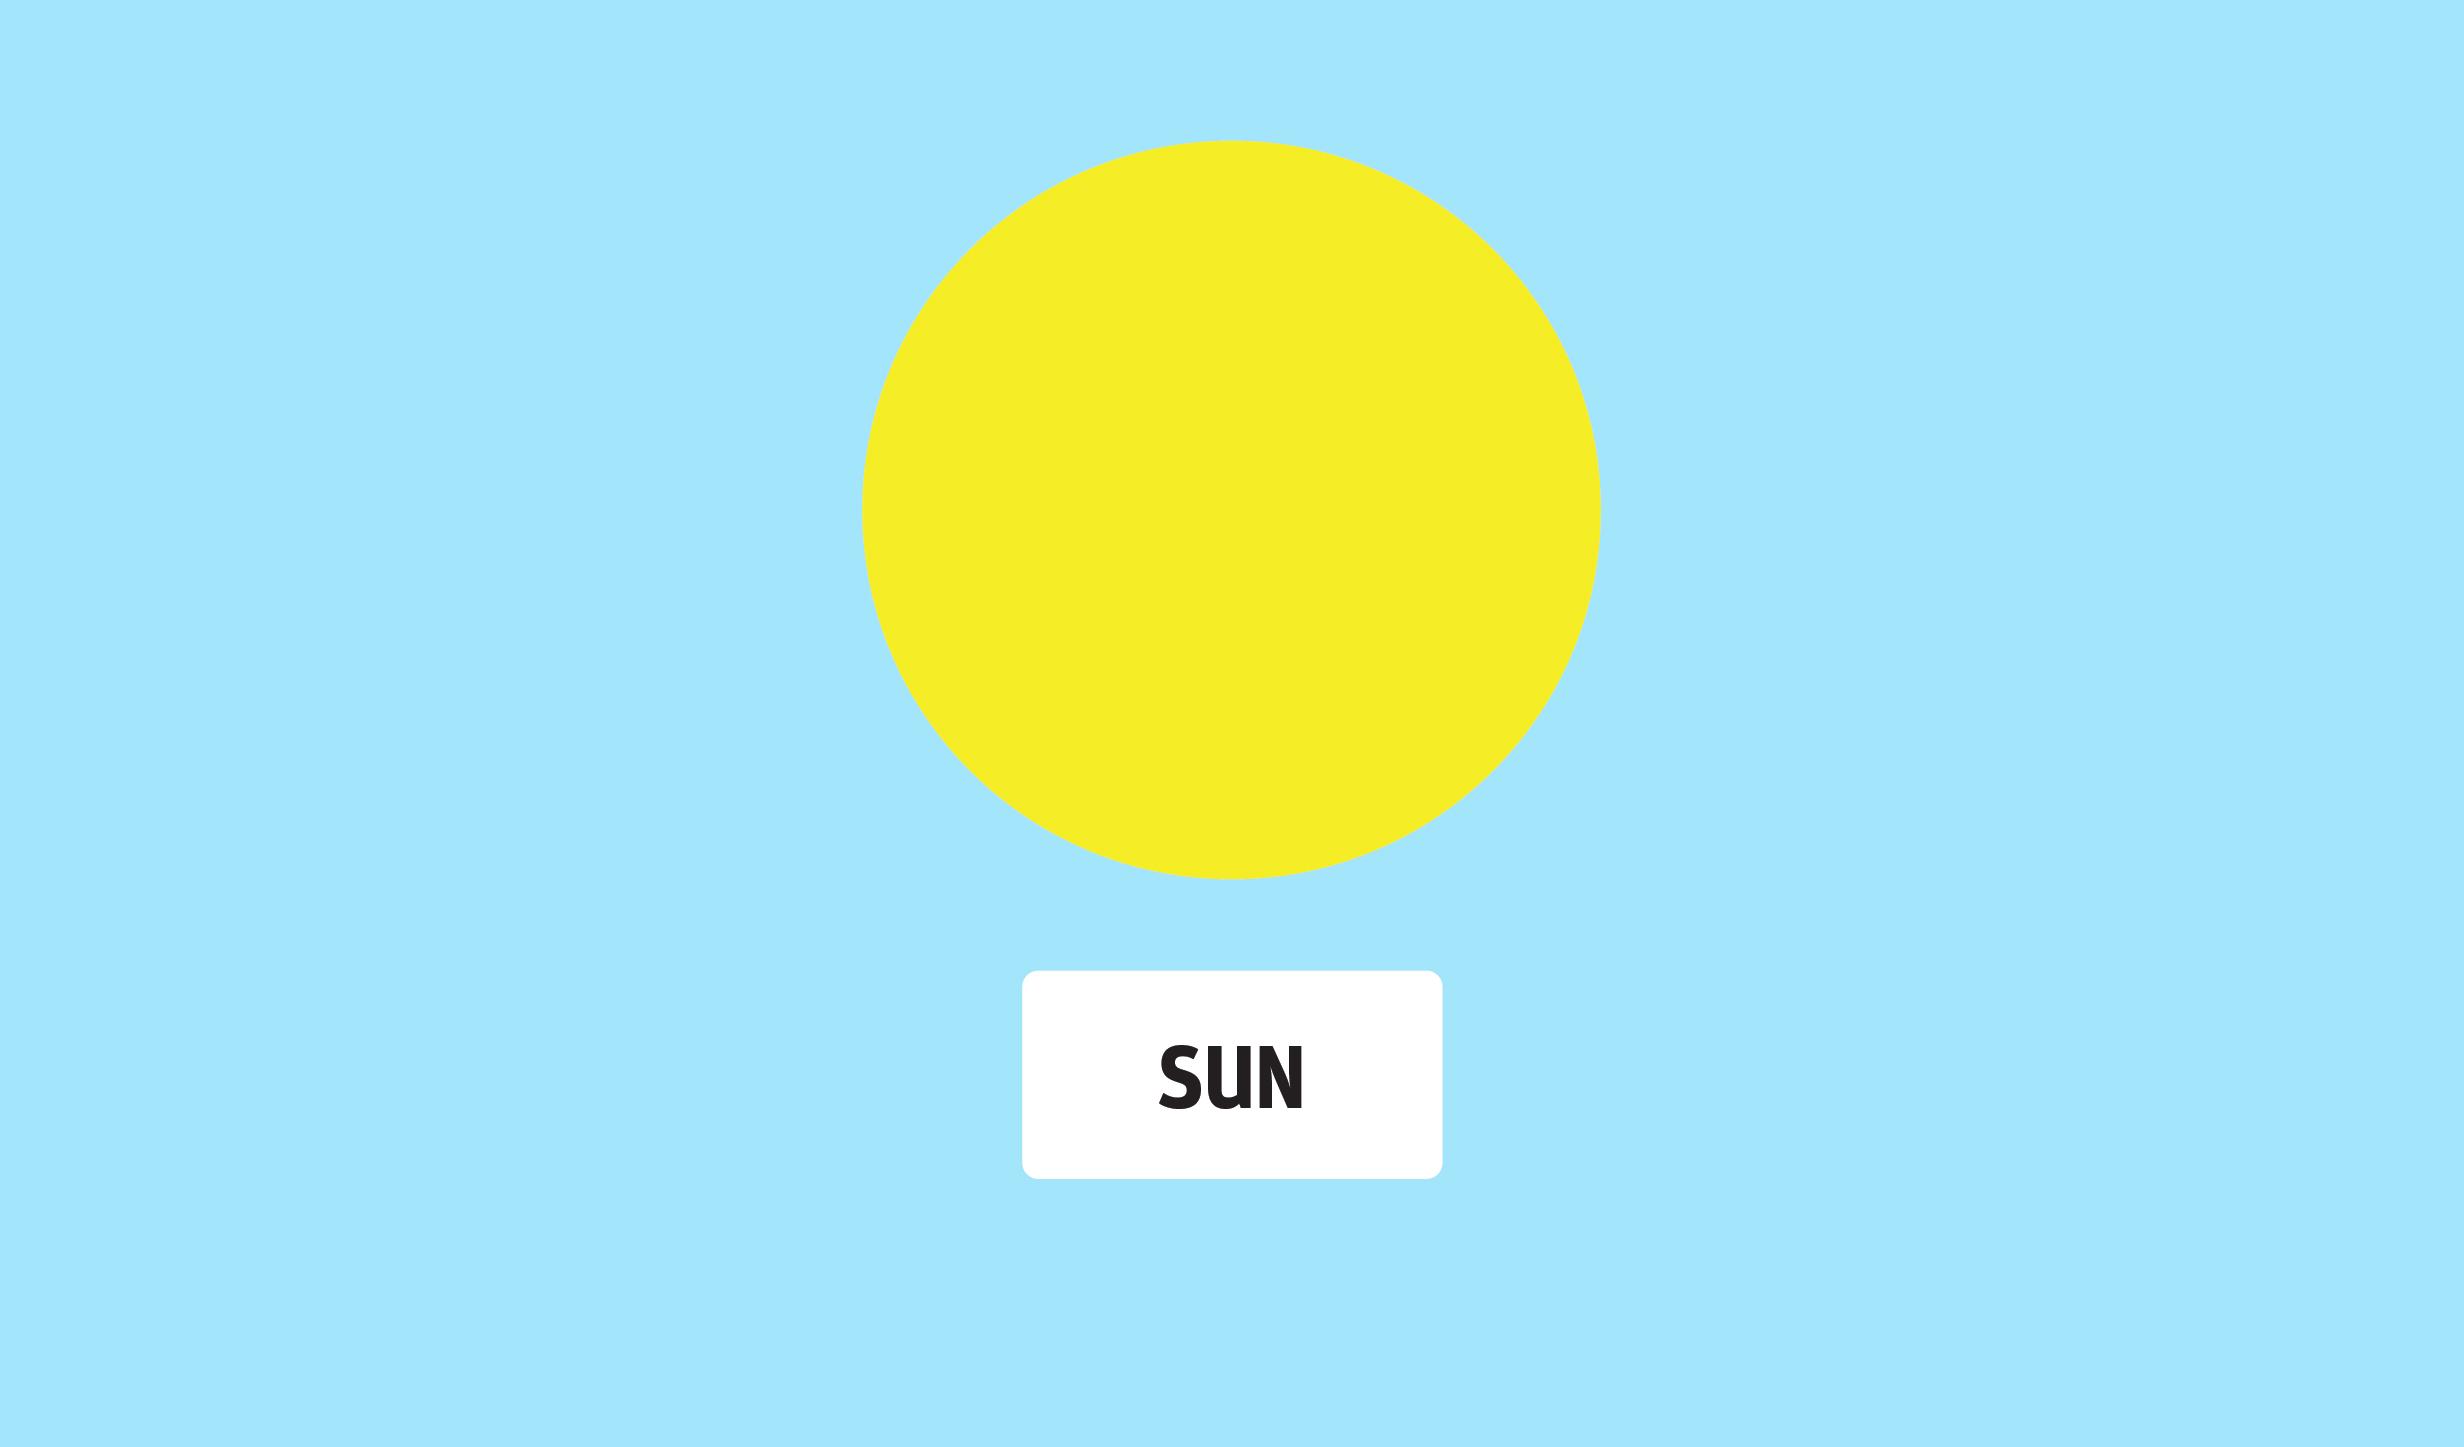 Sun example-01.jpg